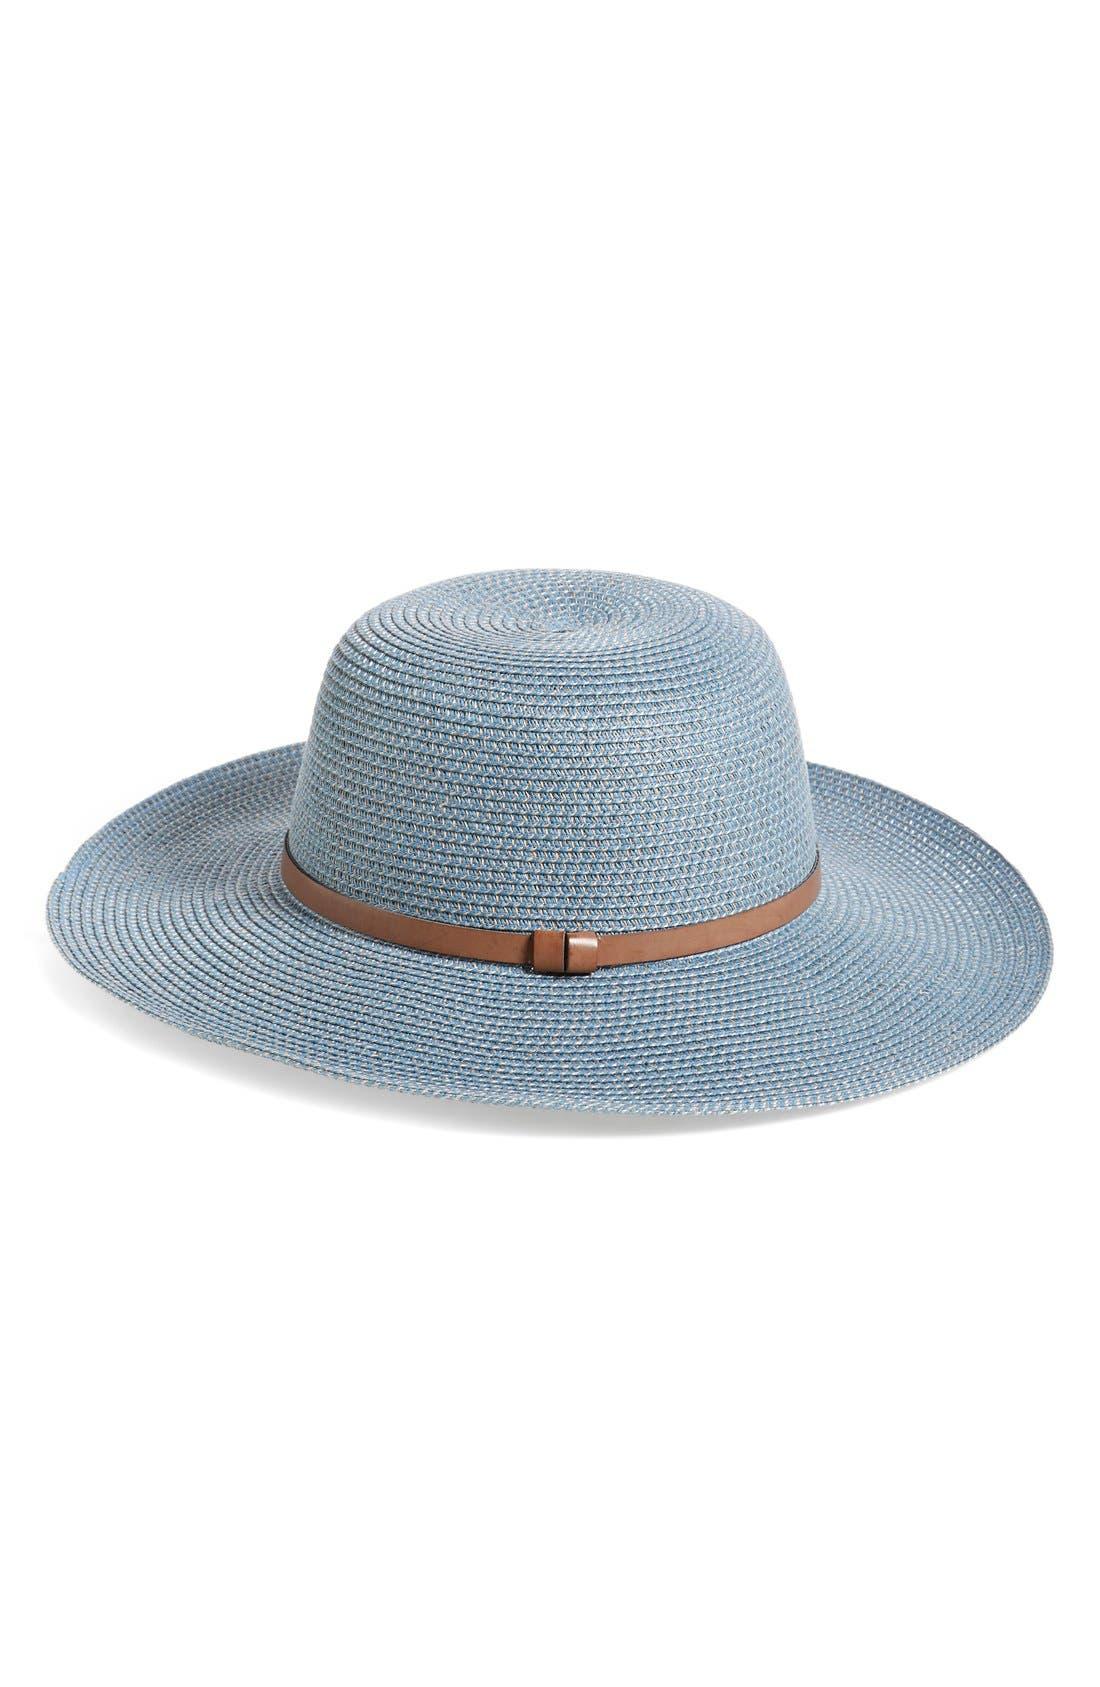 Main Image - Nordstrom Straw Floppy Hat